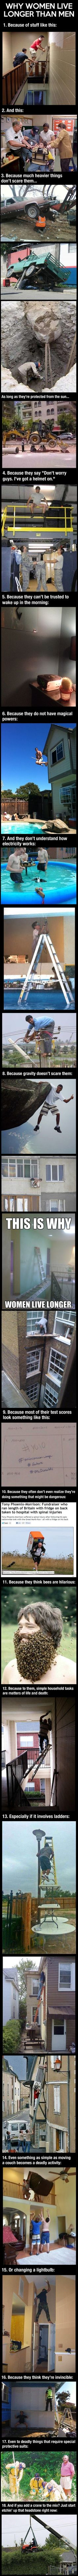 Why women live longer than men link!!!